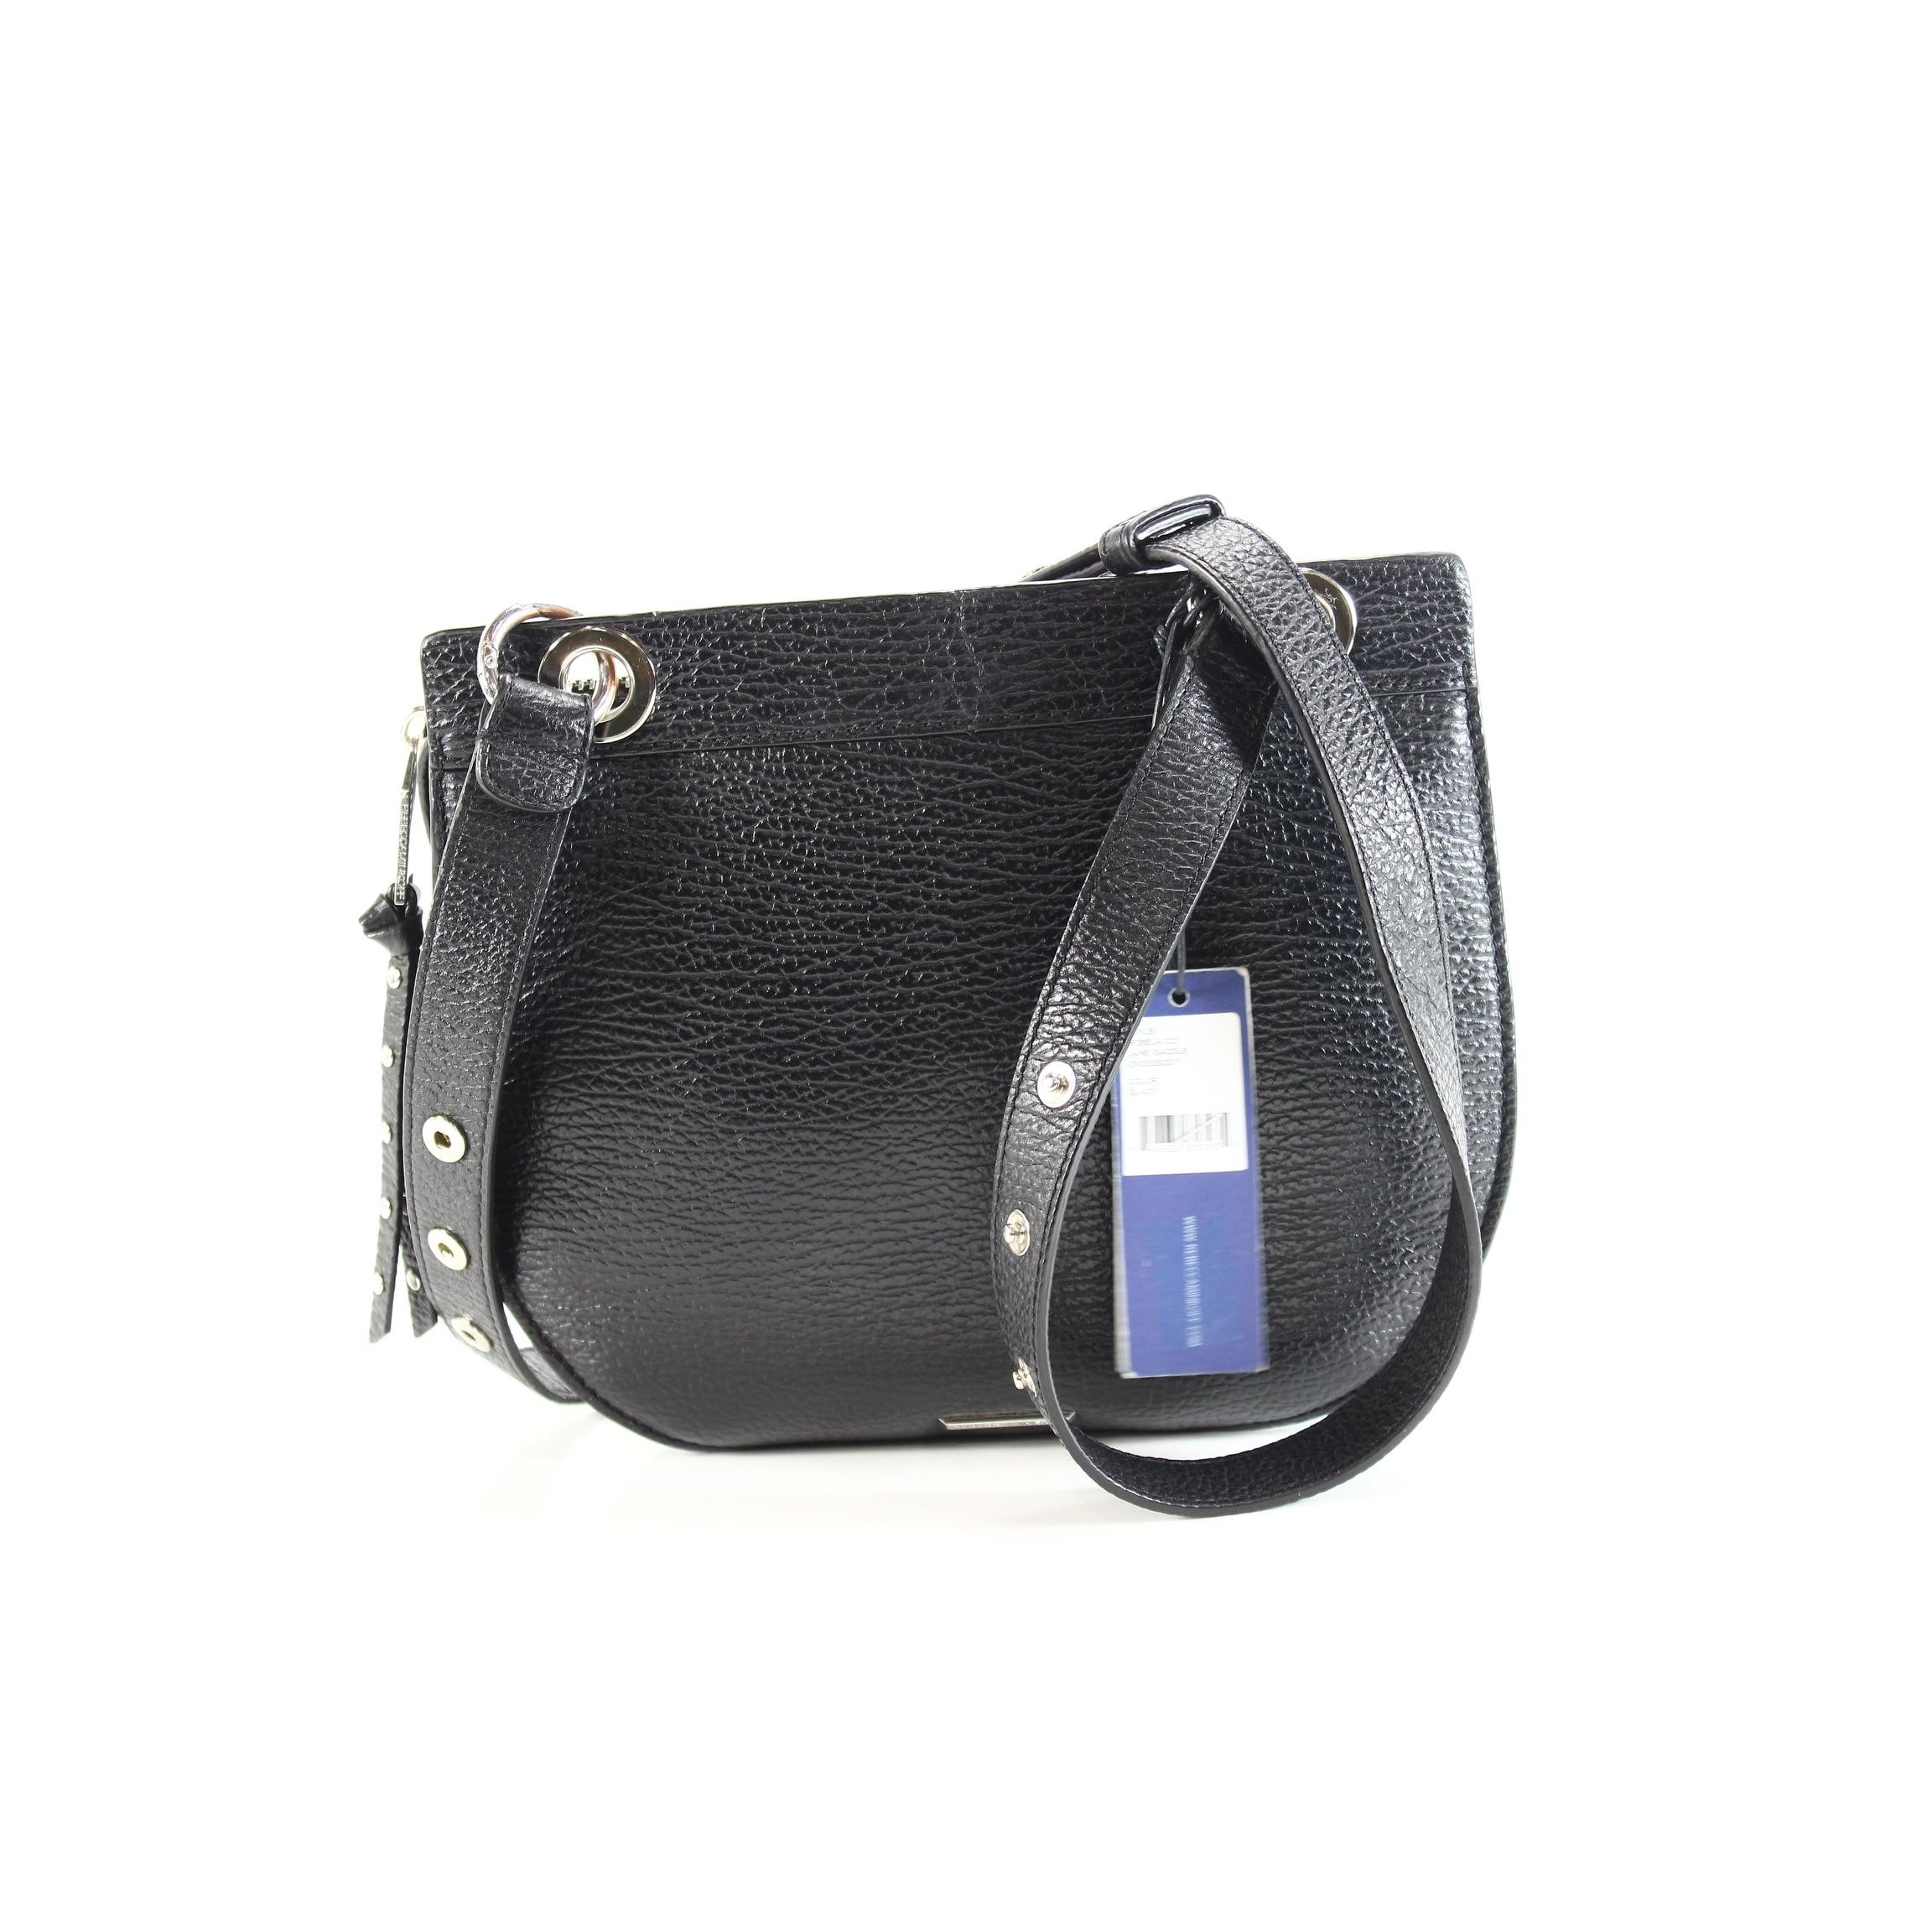 3daecce16c Shop Rebecca Minkoff NEW Jane Saddle Black Crossbody Leather Handbag Purse  - Free Shipping Today - Overstock.com - 19844594